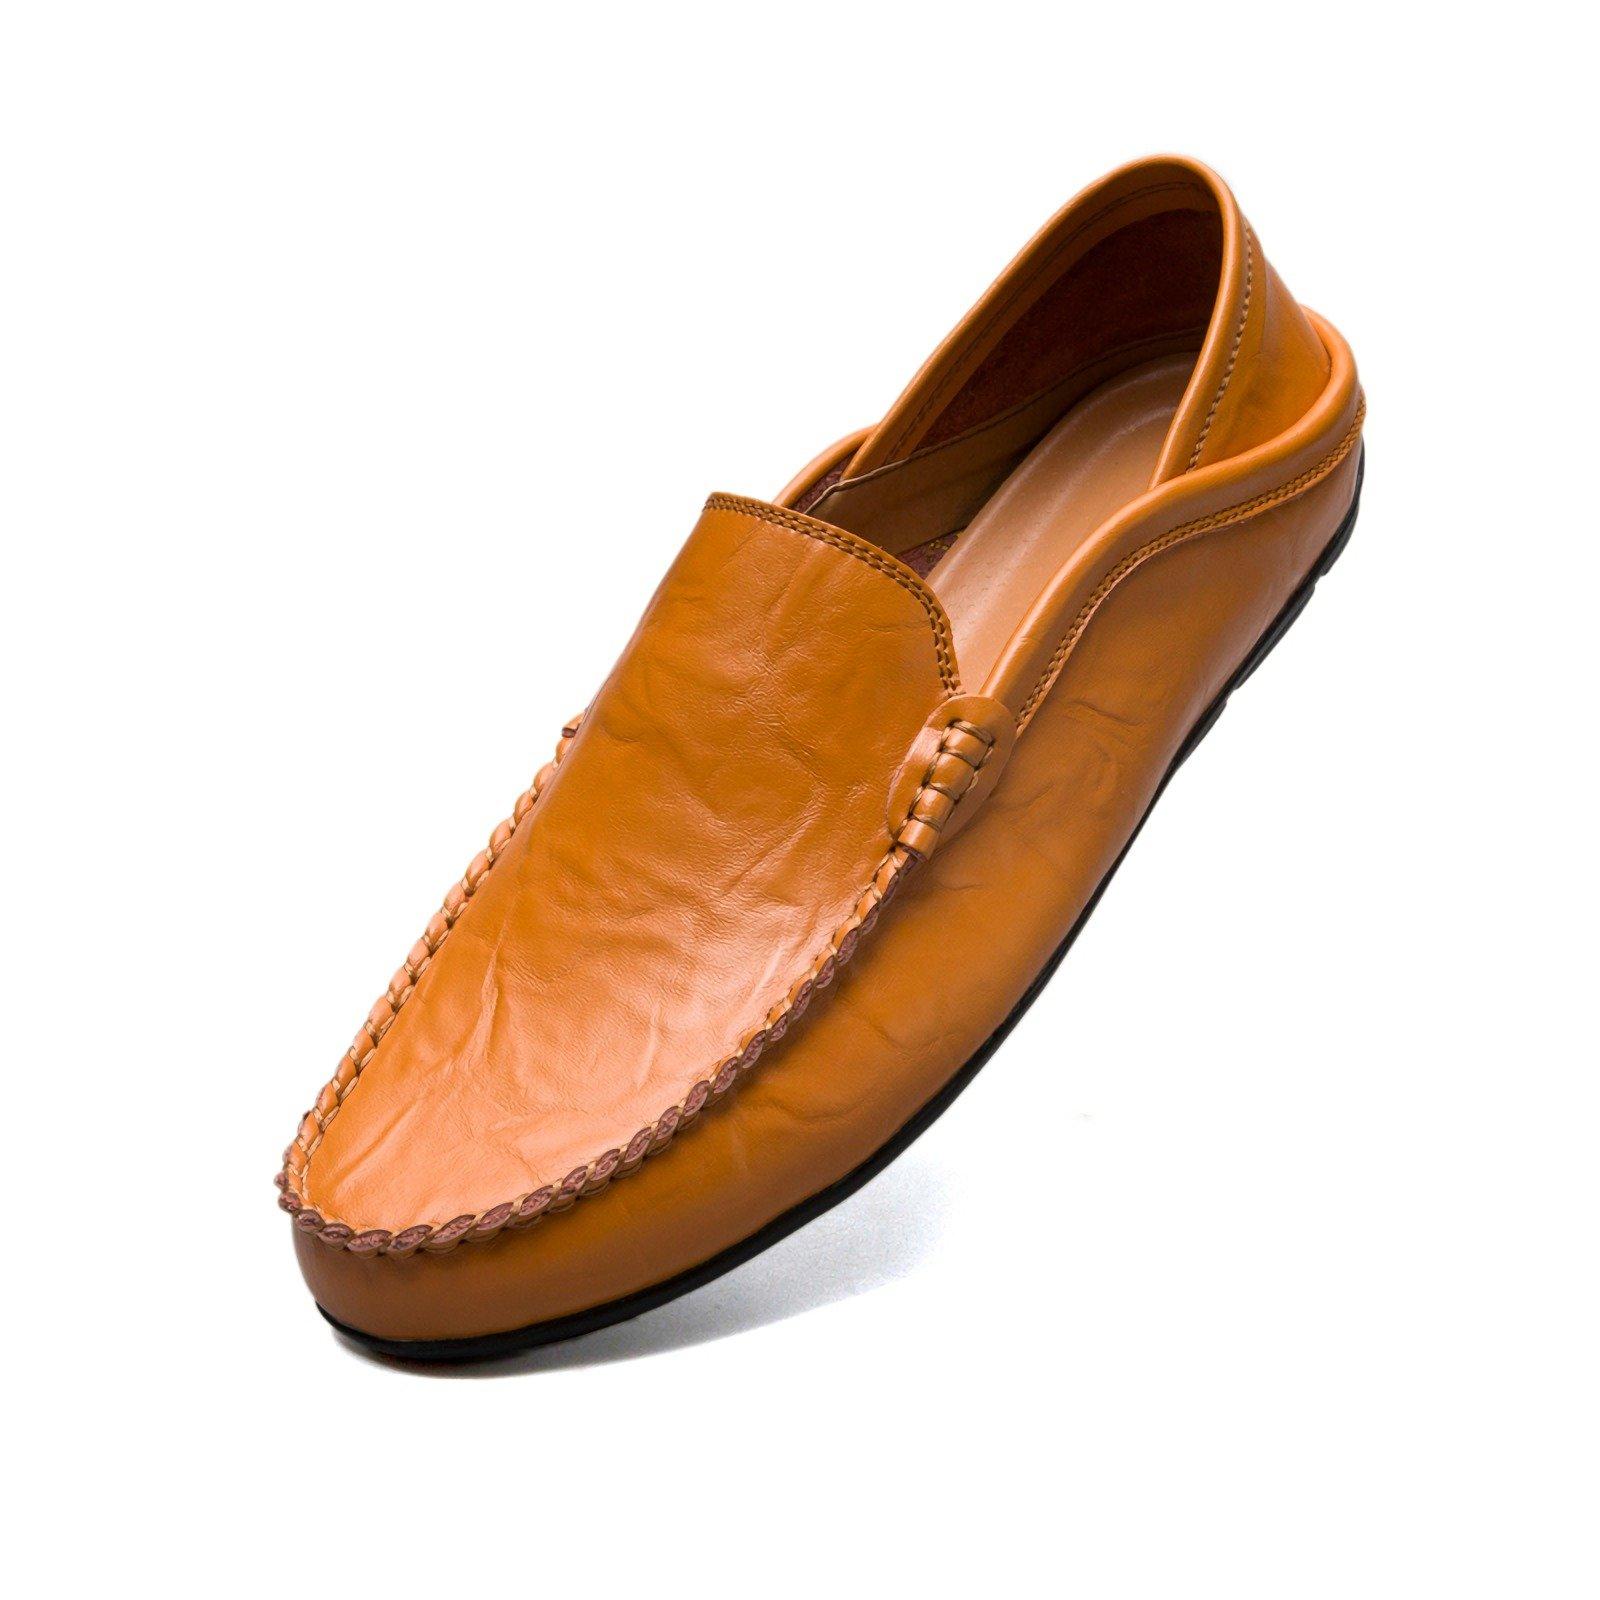 Handmade Genuine Leather Men Flats, Fashion Soft Leather Men Shoes Loafers men Slip On Leather Shoes (7.5, Yellow)